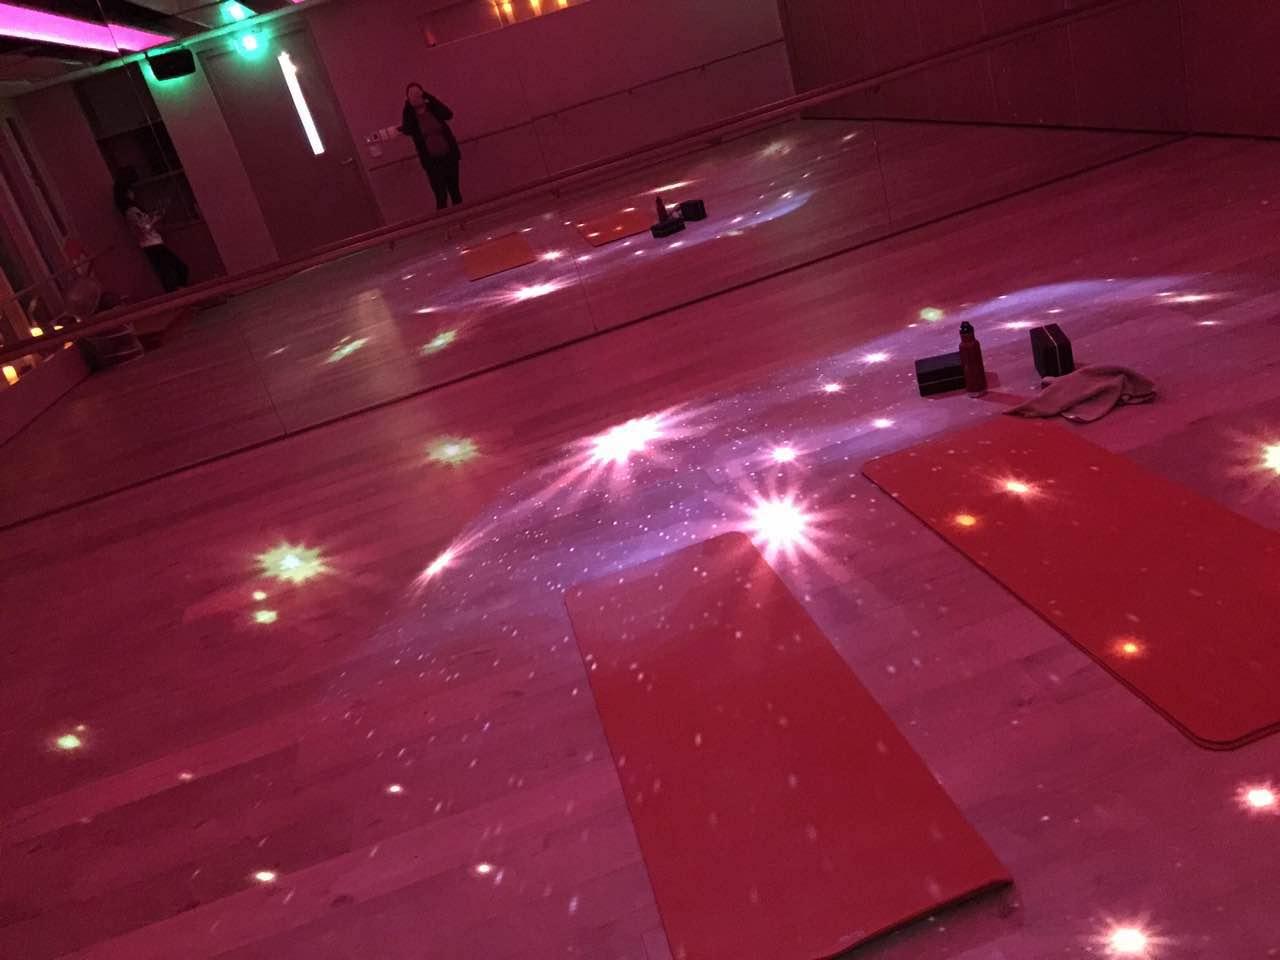 Yoga/Barre room